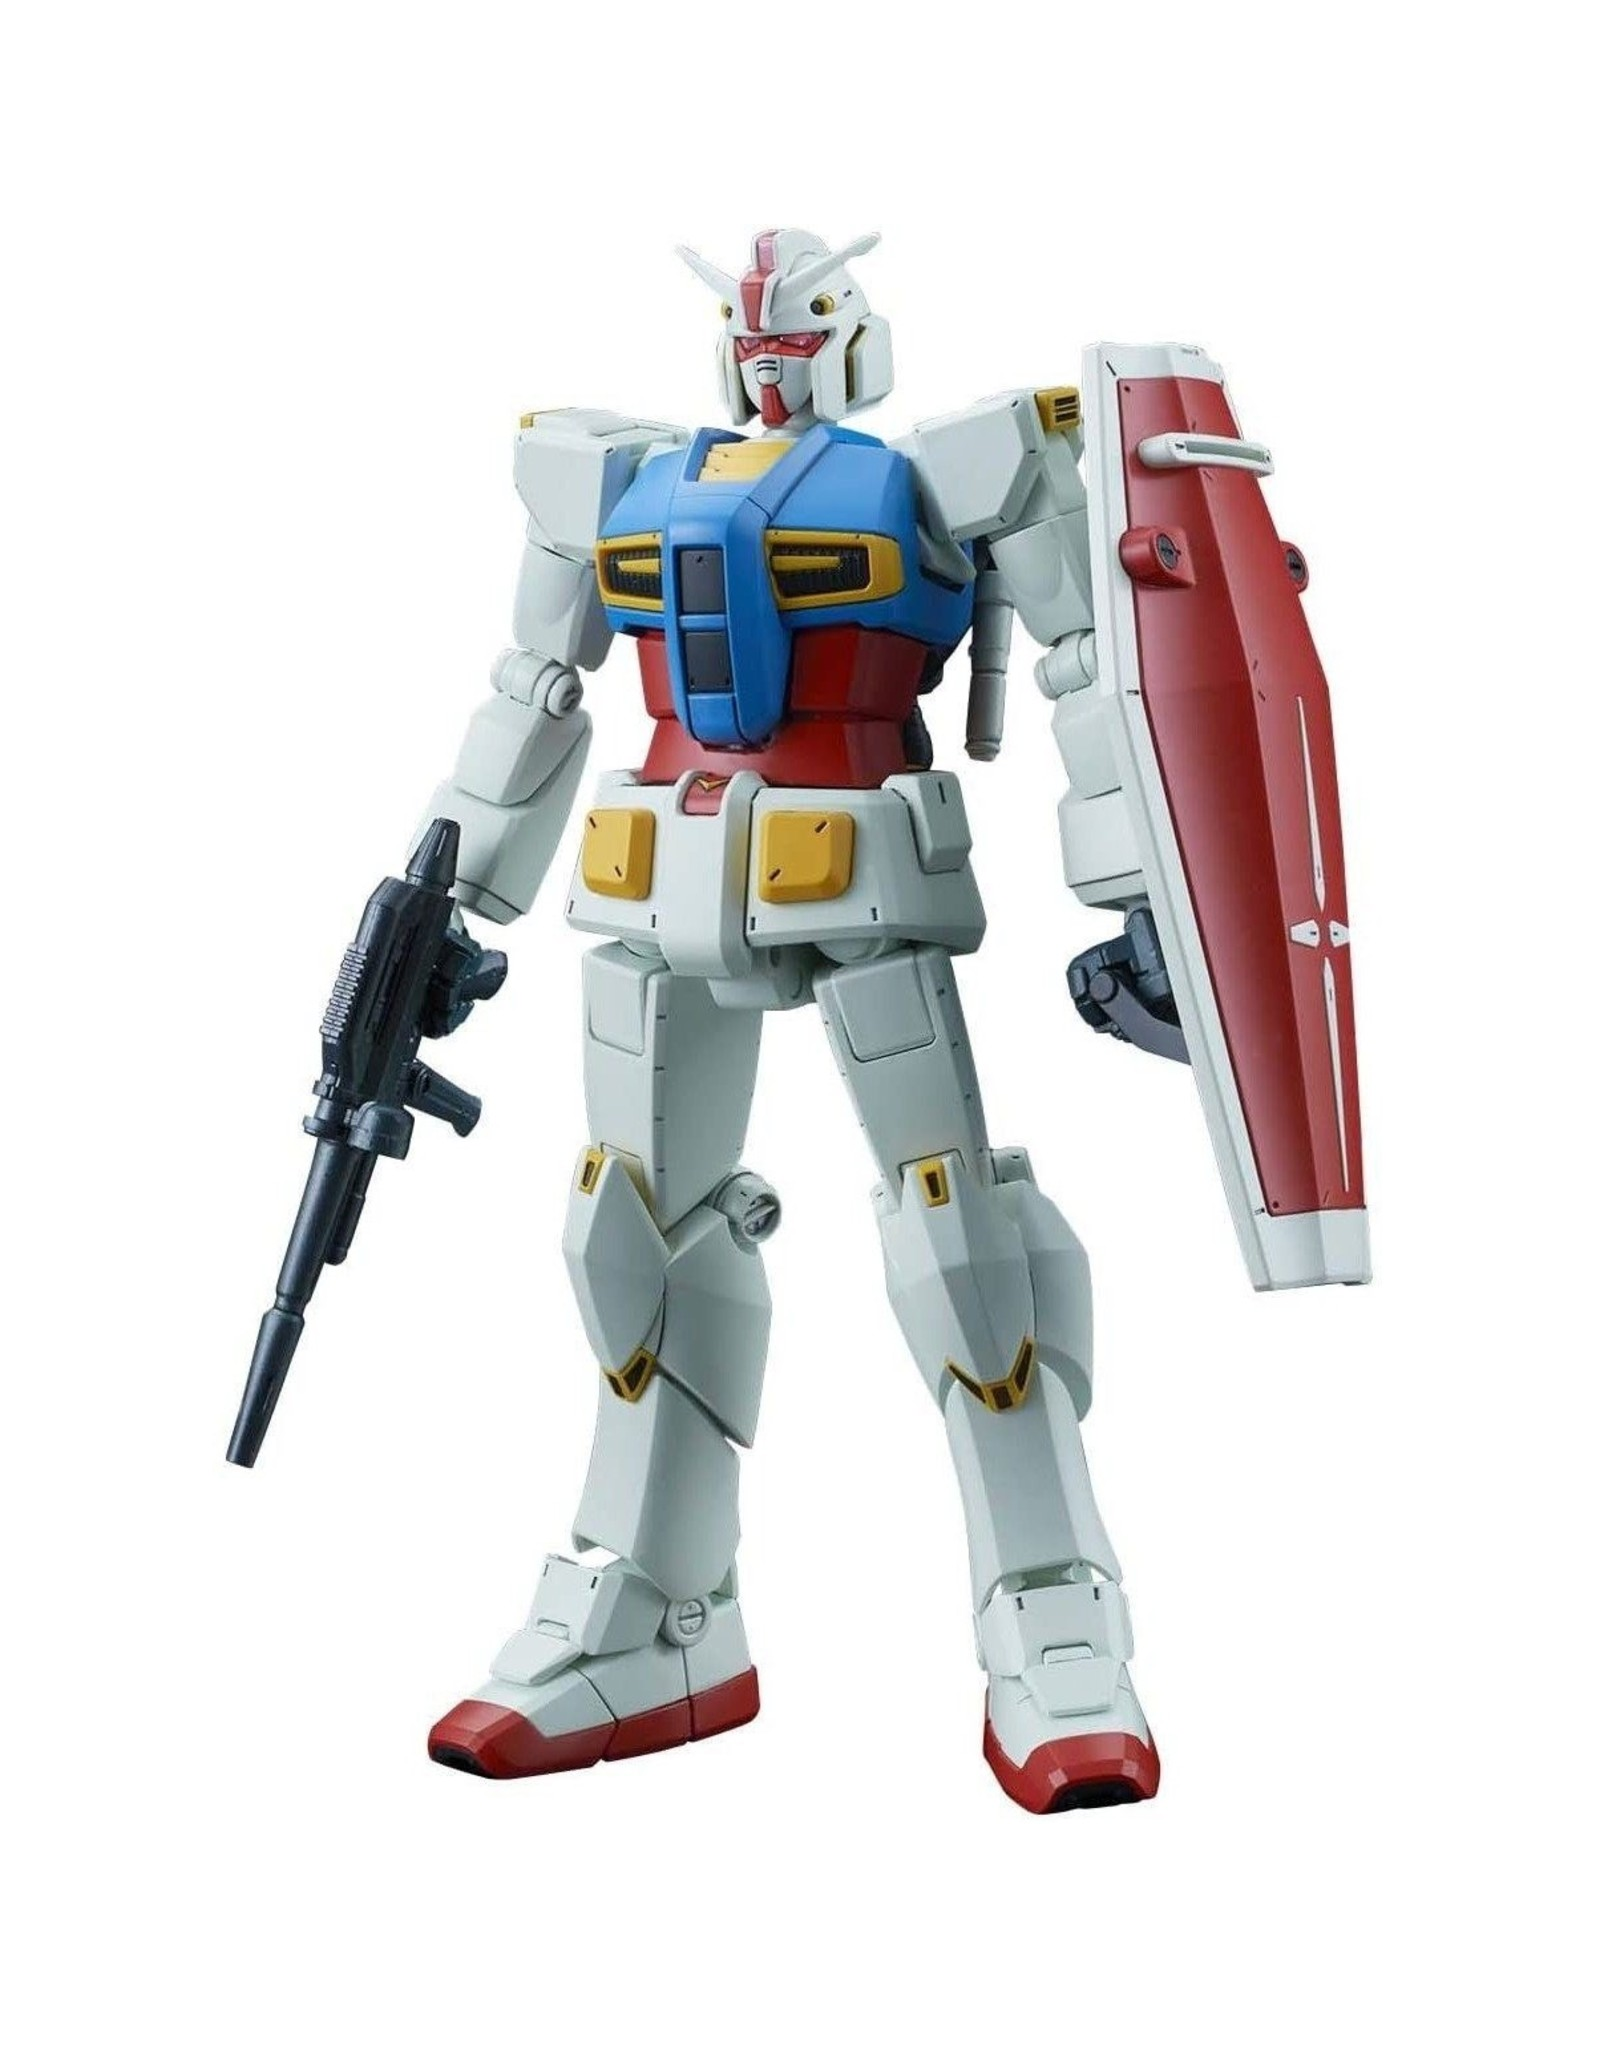 Bandai Gundam G40 (Industrial Design Ver.) Model Kit; HG 1/144